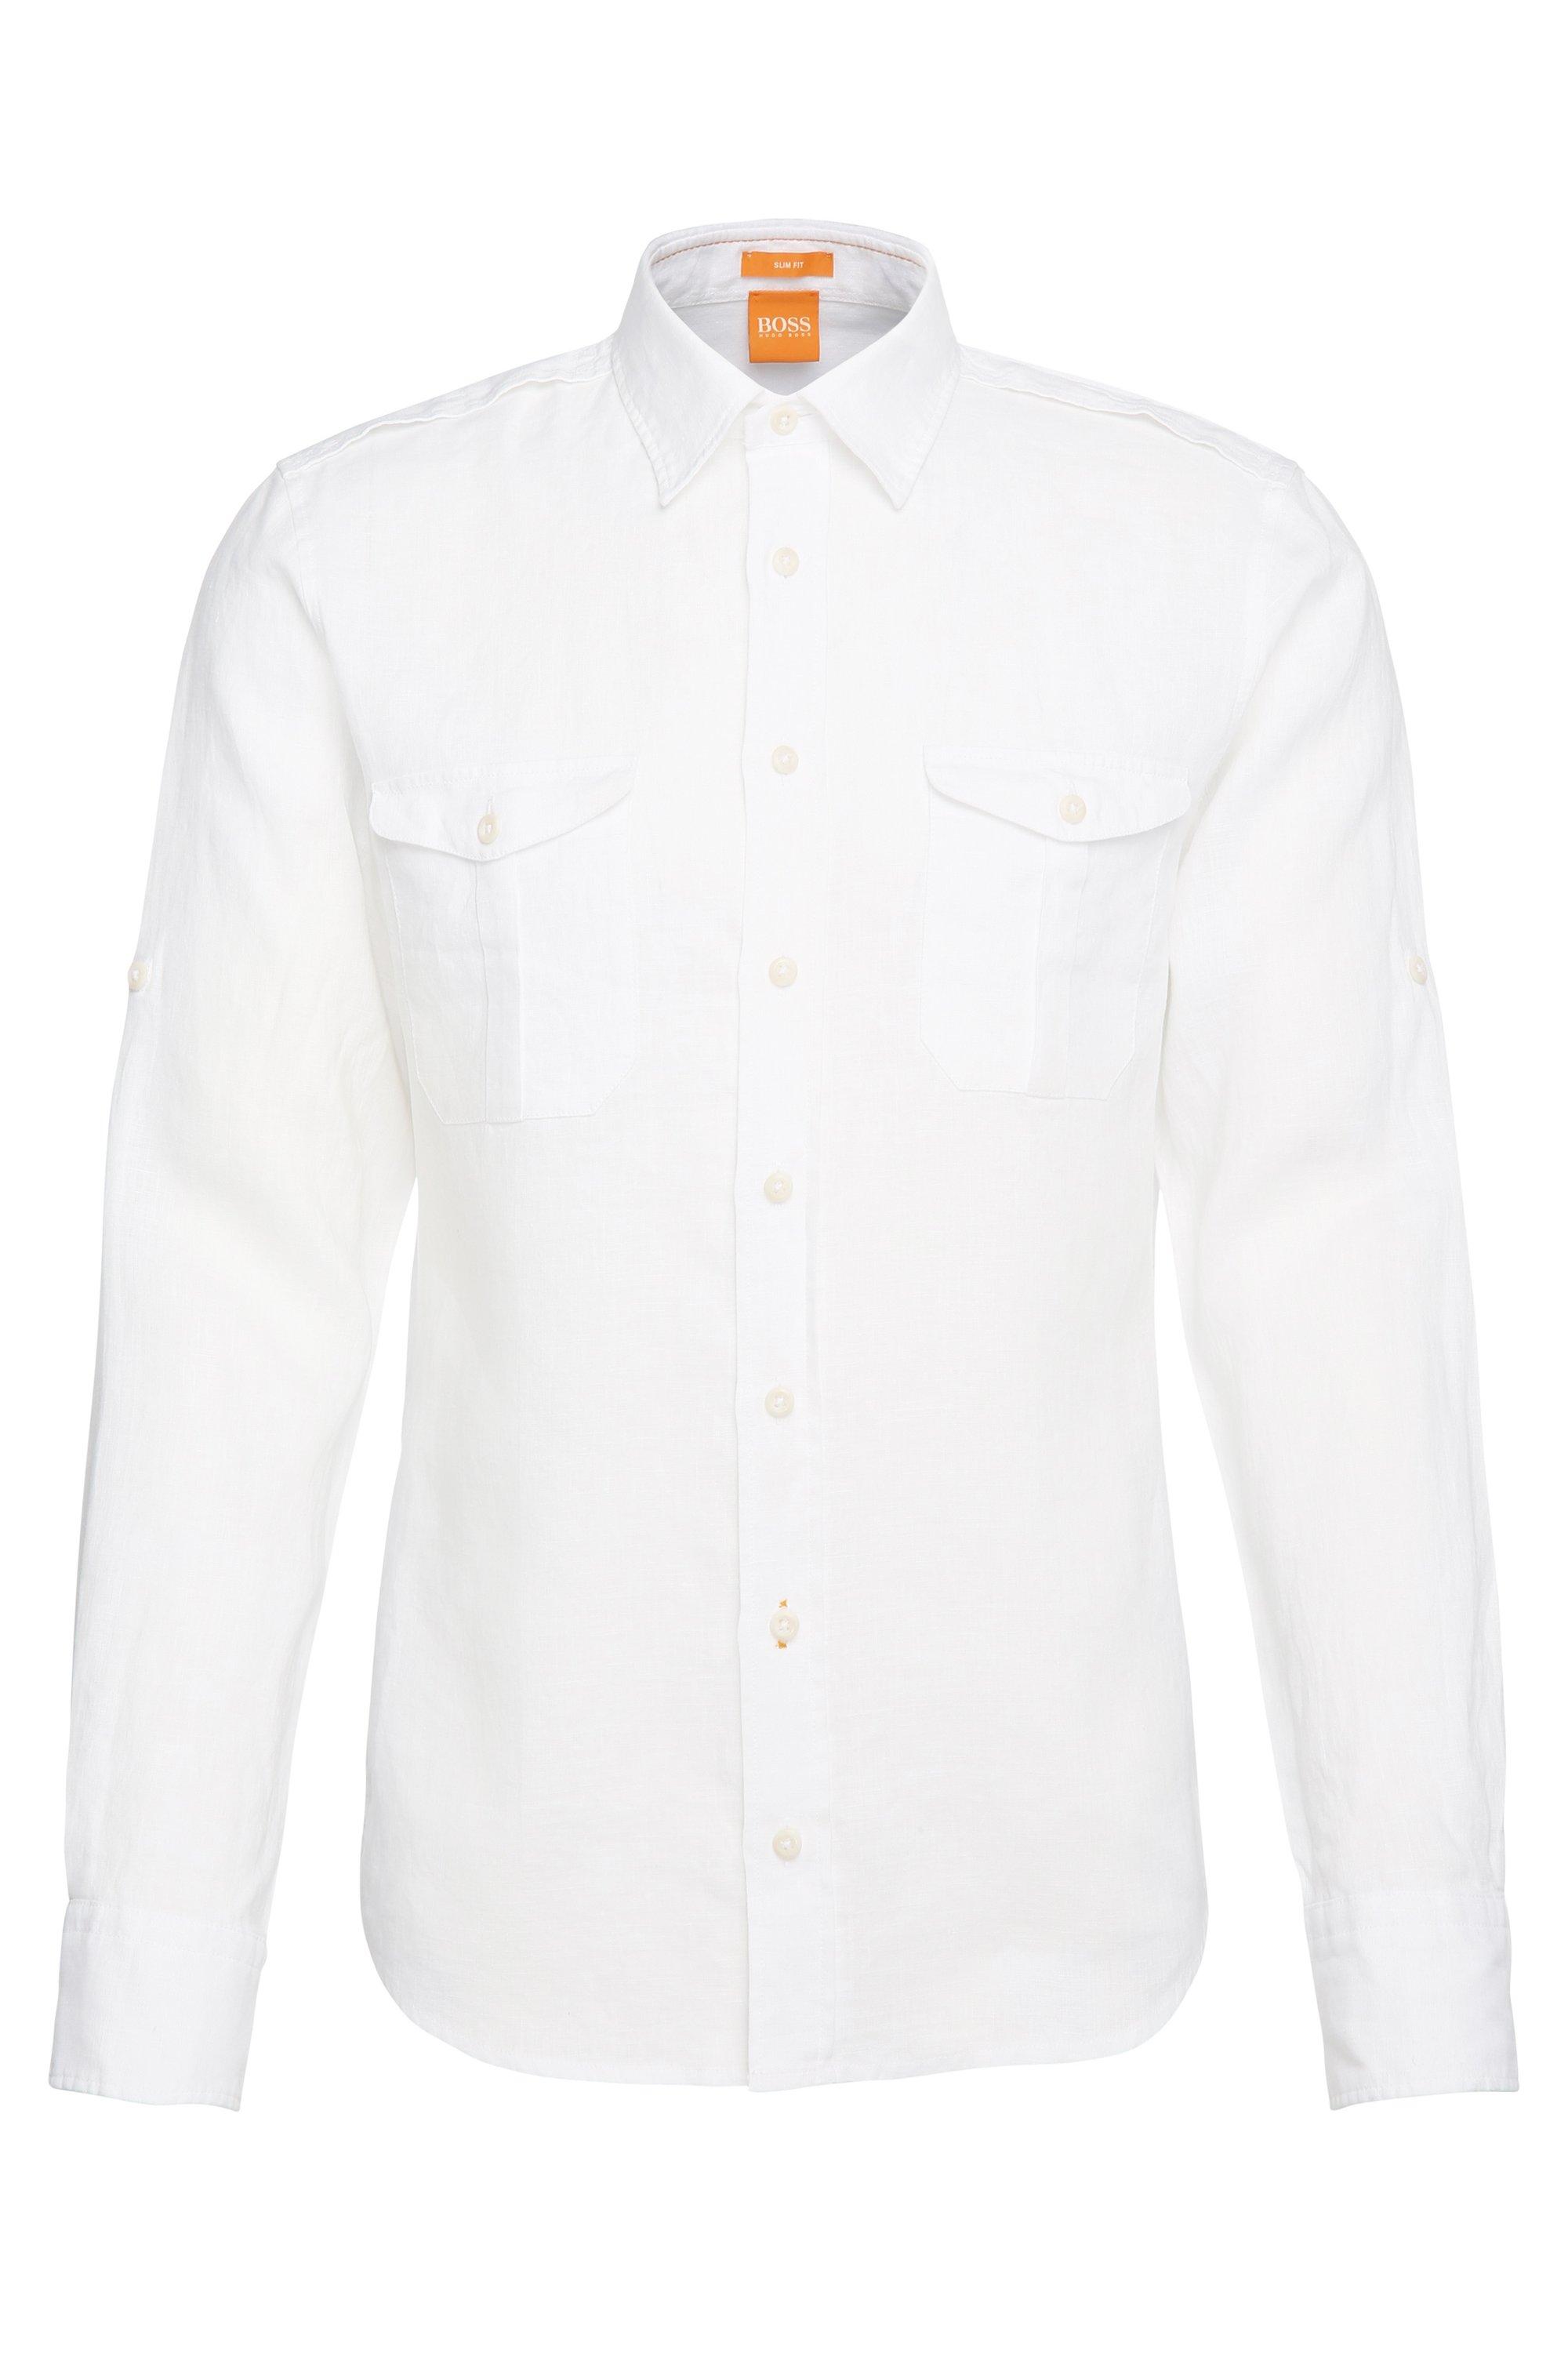 Cotton Button Down Shirt, Slim Fit | Cadetto, White